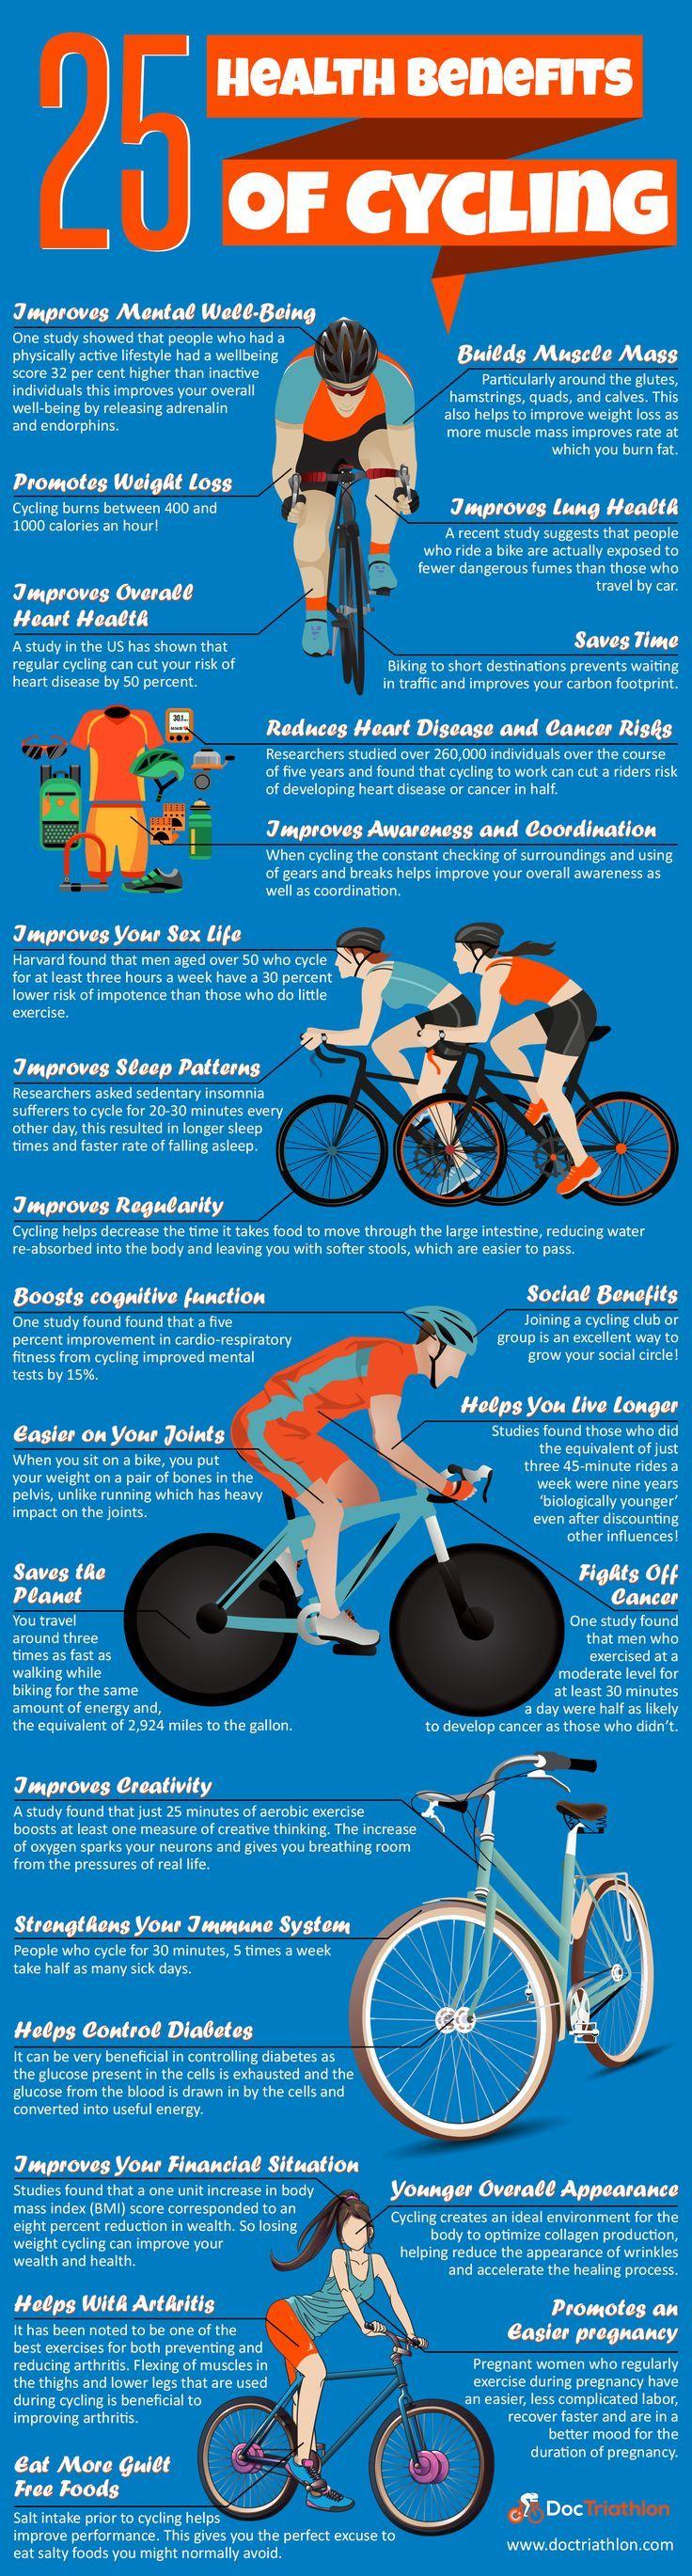 25 Health Benefits of Cycling #cyclingworkout #cyclingforbeginners | #doctriathlon